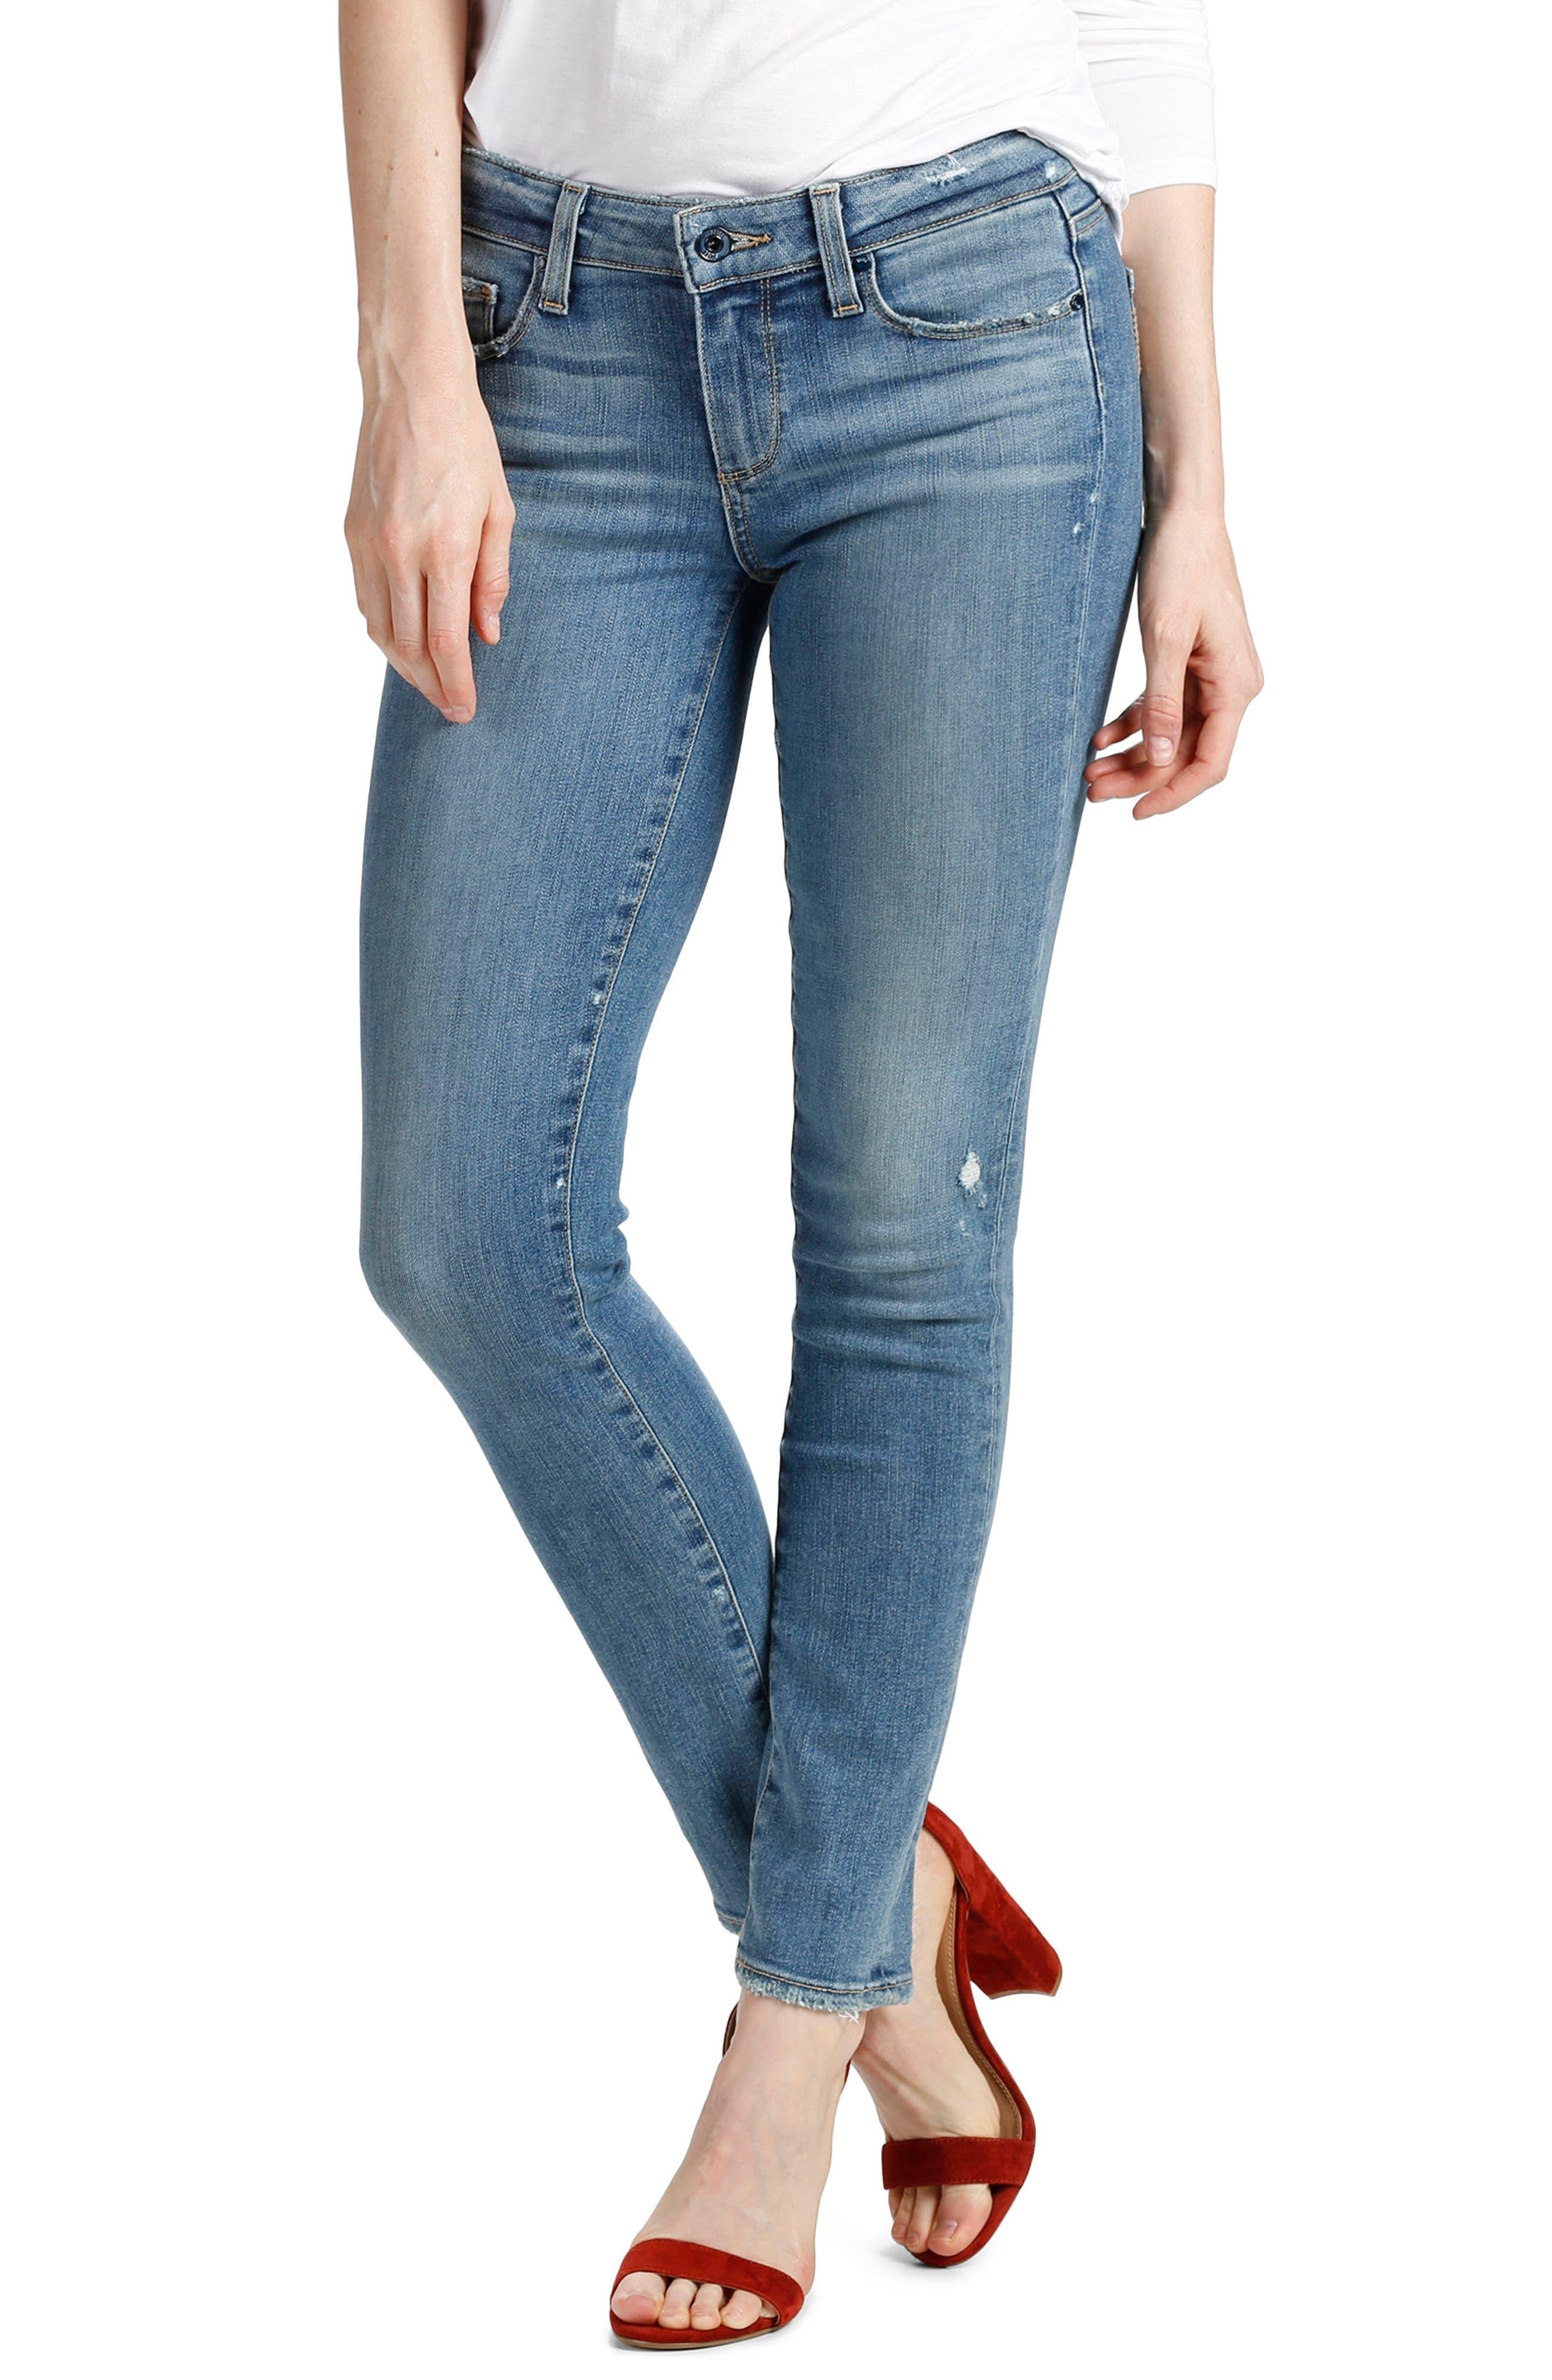 PAIGE Transcend - Skyline Ankle Peg Skinny Jeans